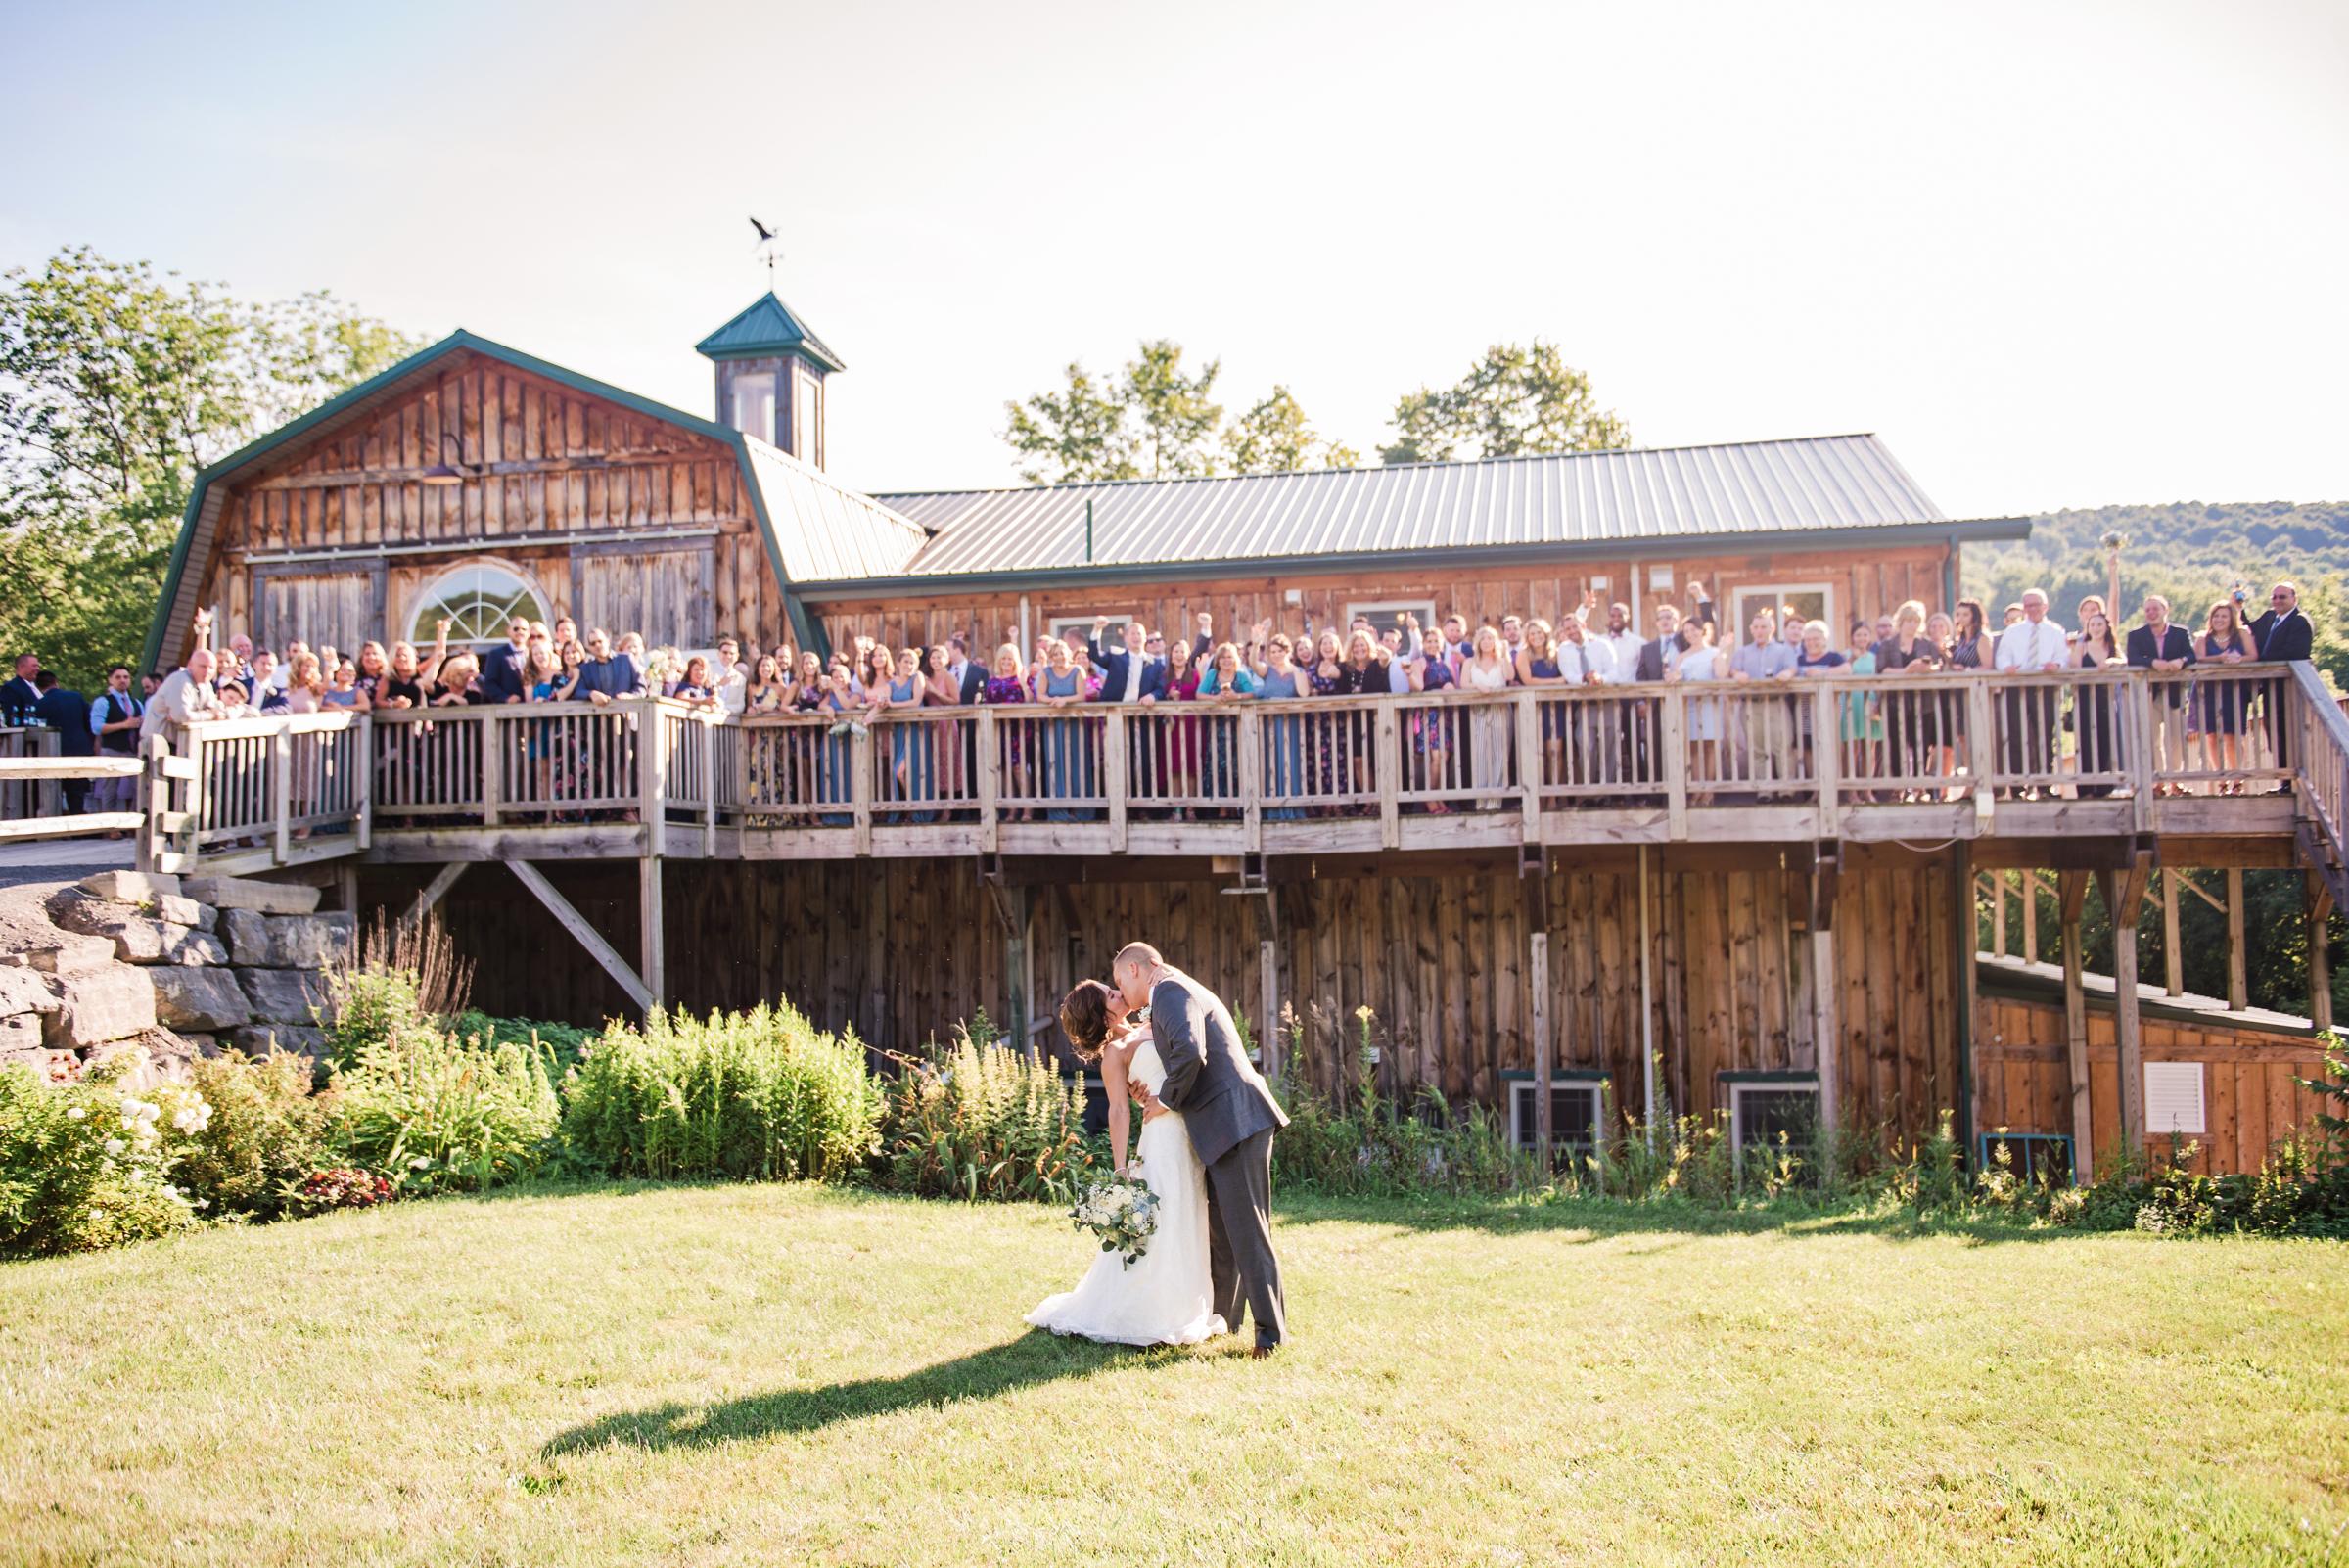 Wolf_Oak_Acres_Central_NY_Wedding_JILL_STUDIO_Rochester_NY_Photographer_DSC_5491.jpg